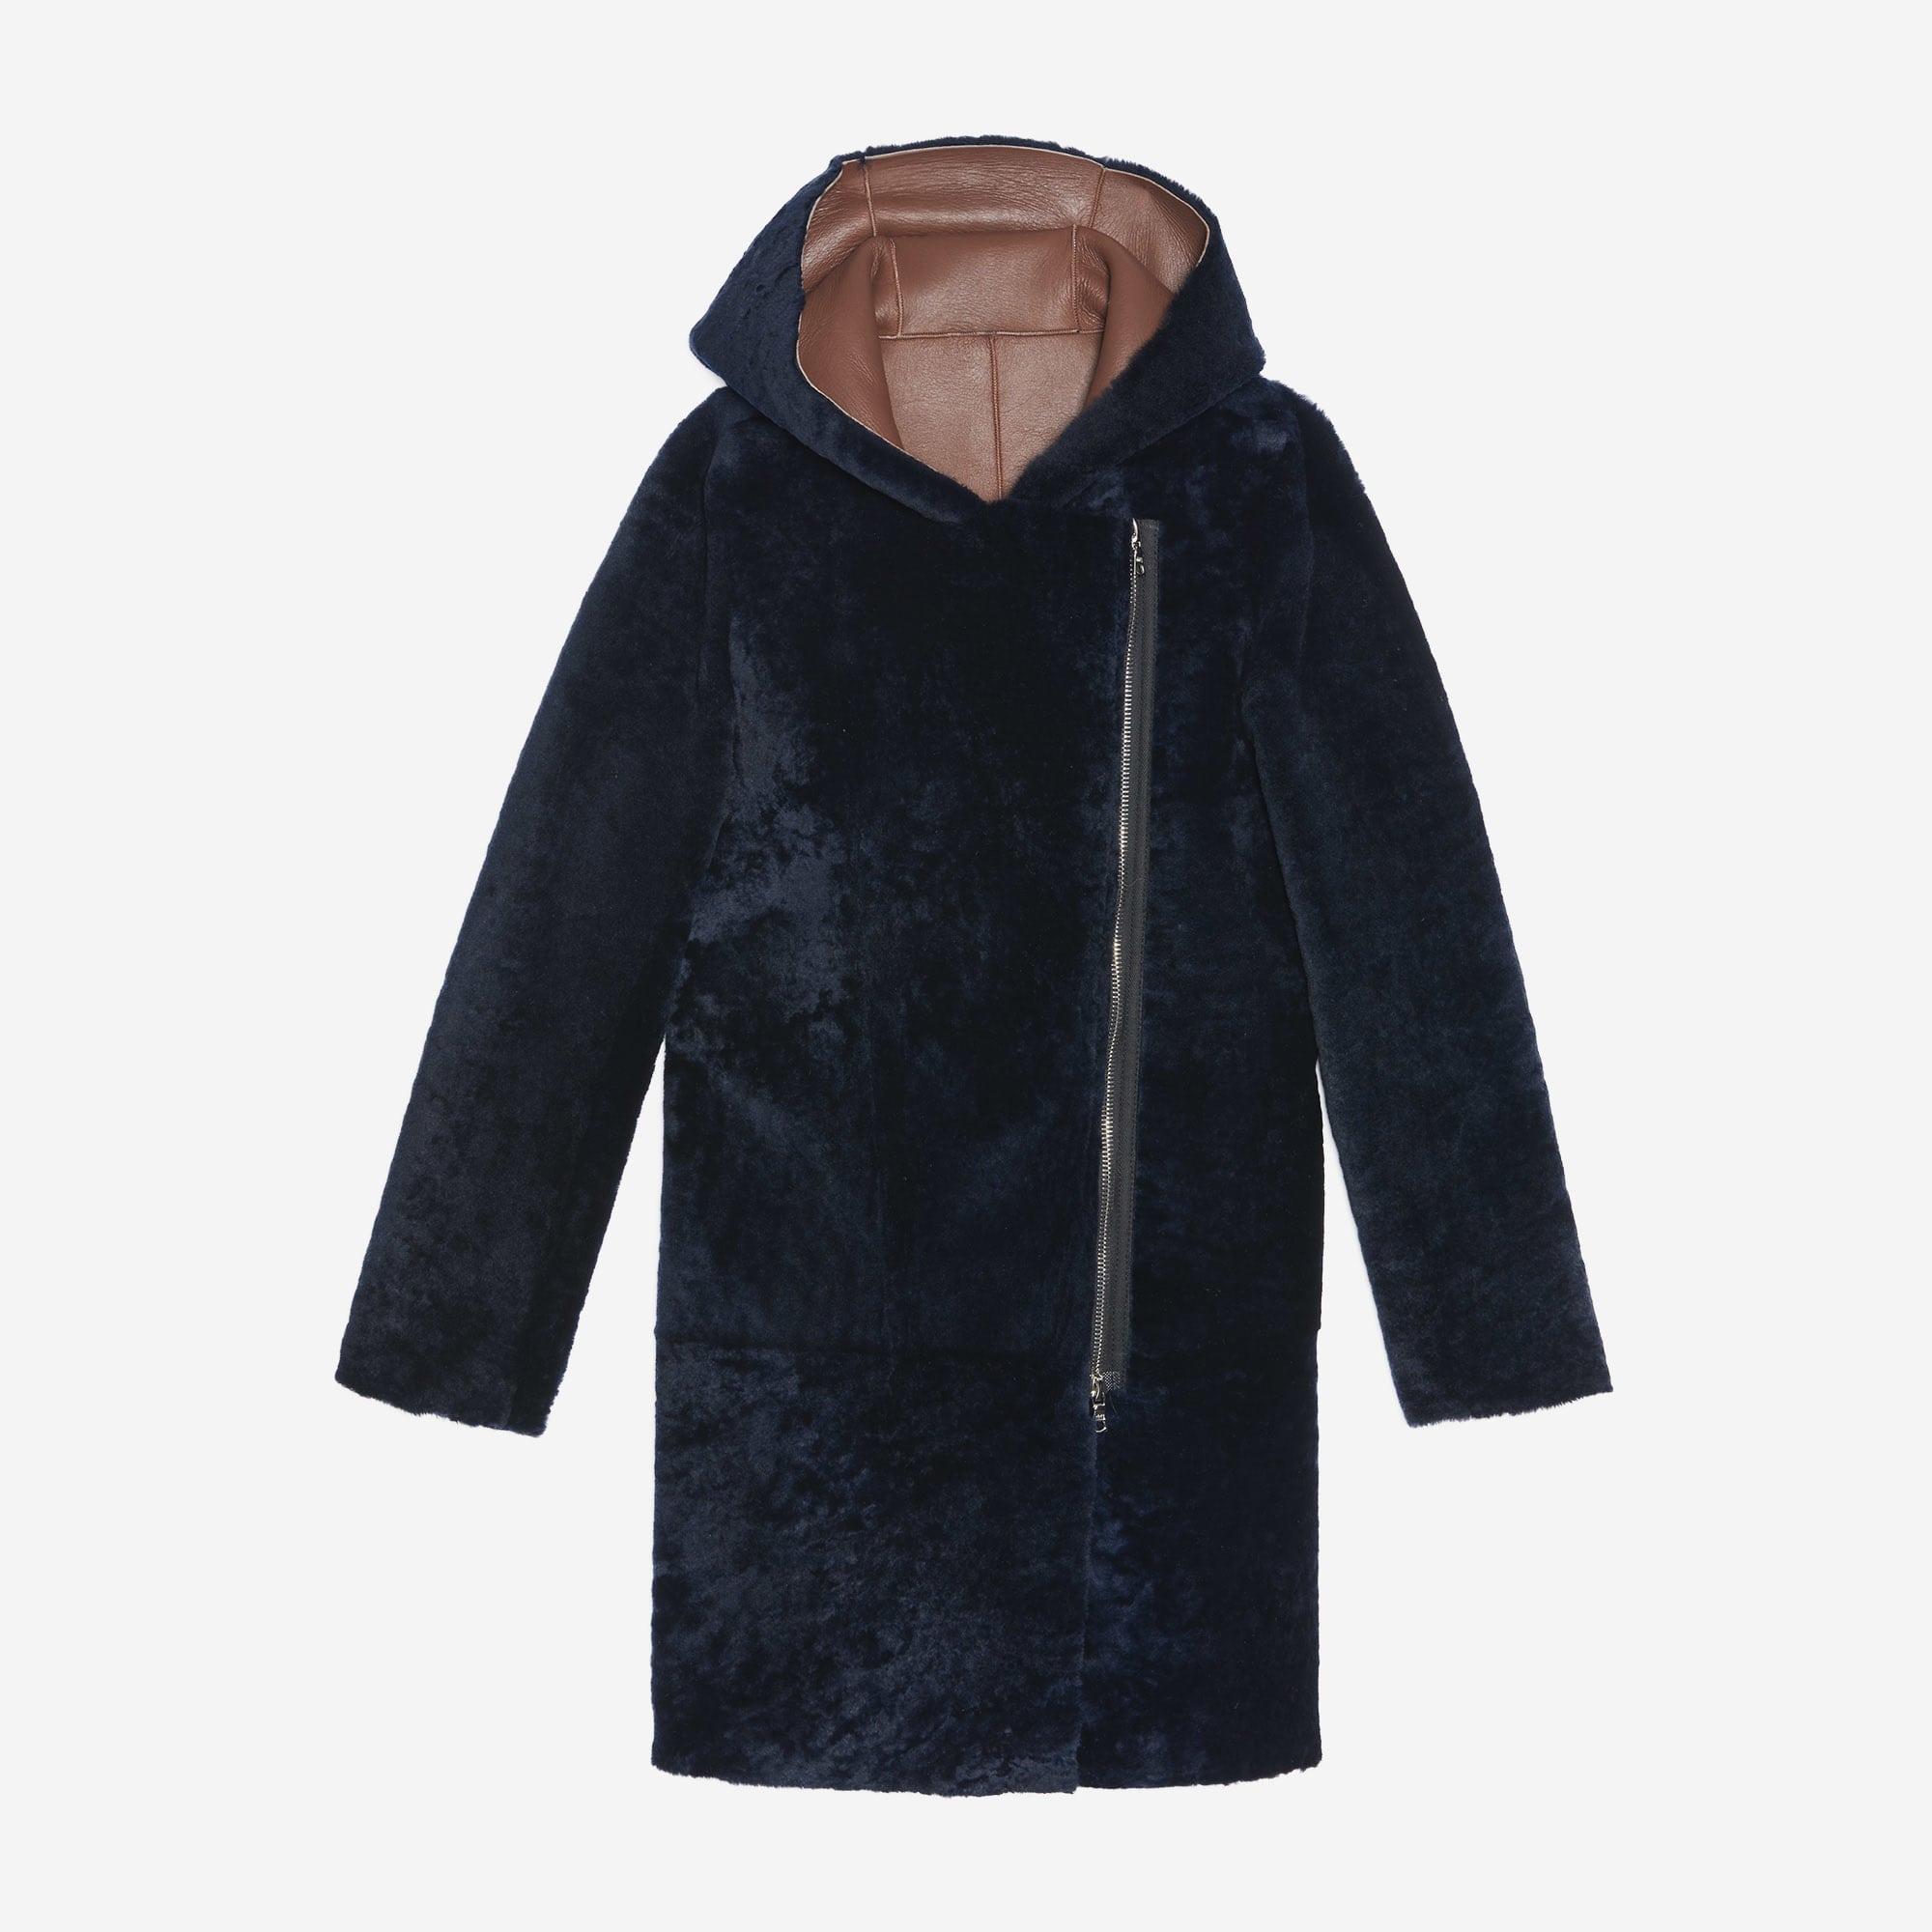 Manteau en fourrure SANDRO 36 (S, T1) bleu vendu par Carlaulrh - 6584819 53342903886